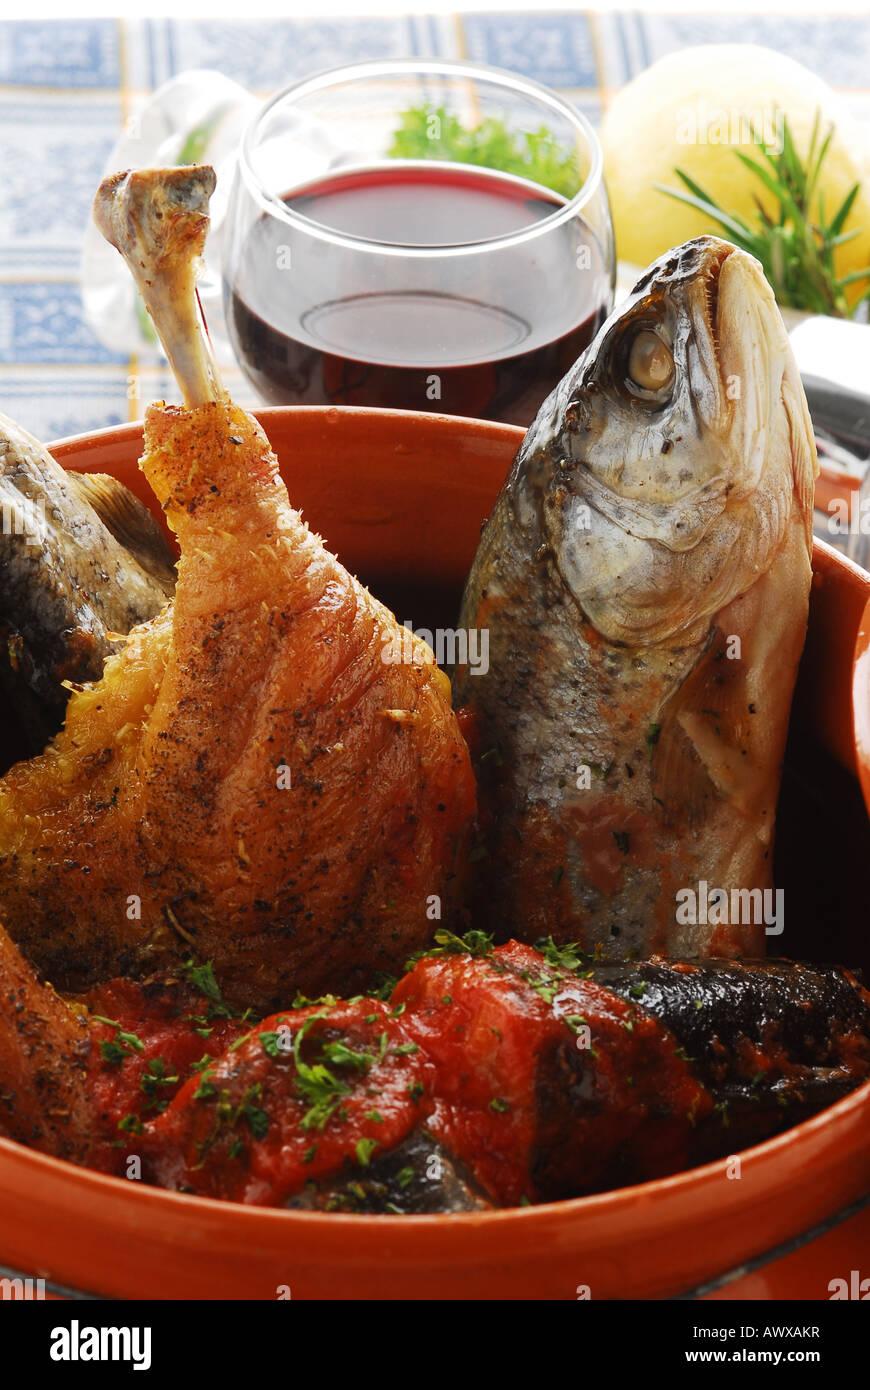 Italien L Stockfotos & Italien L Bilder - Alamy